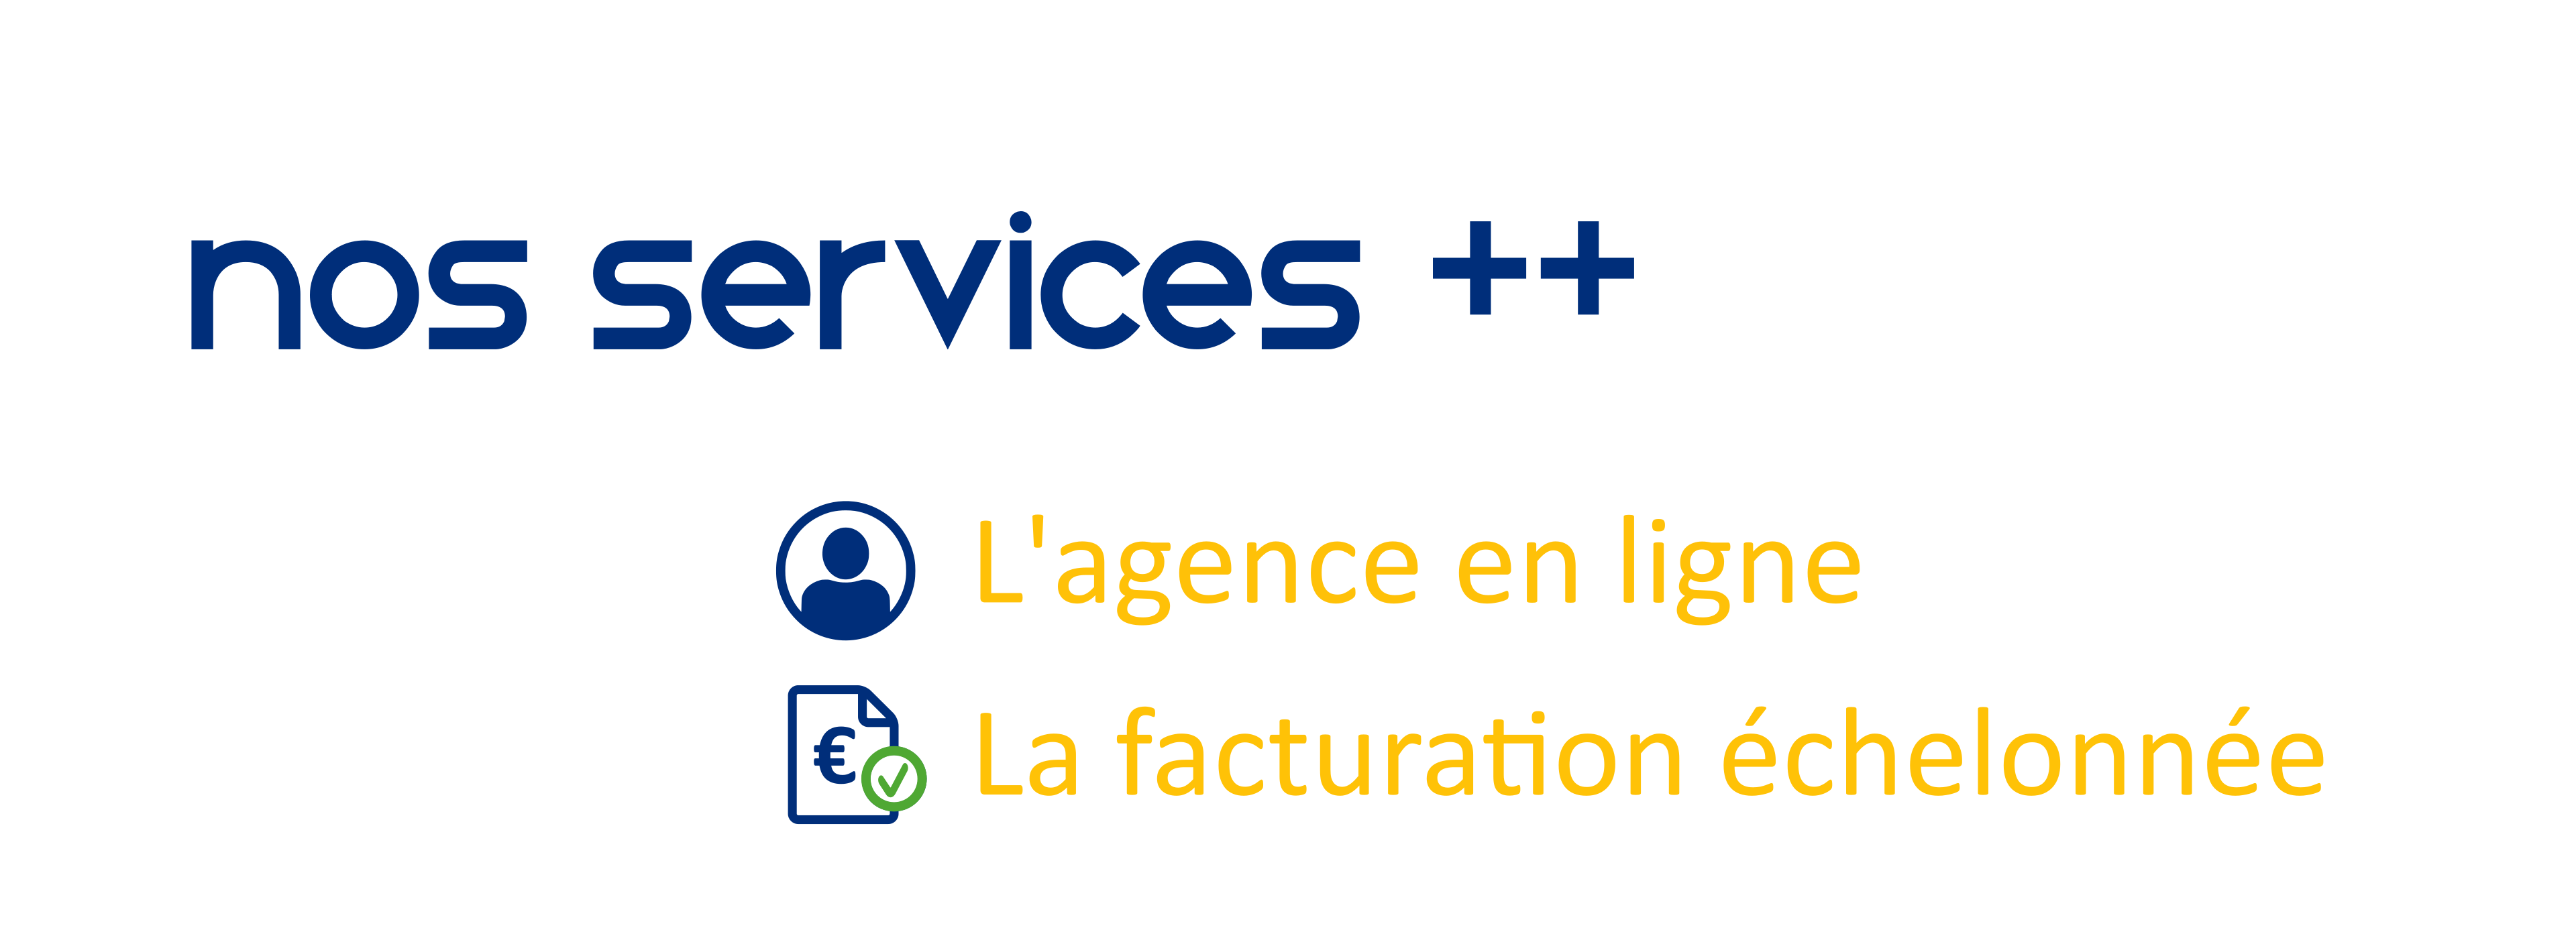 Nos services supplémentaires